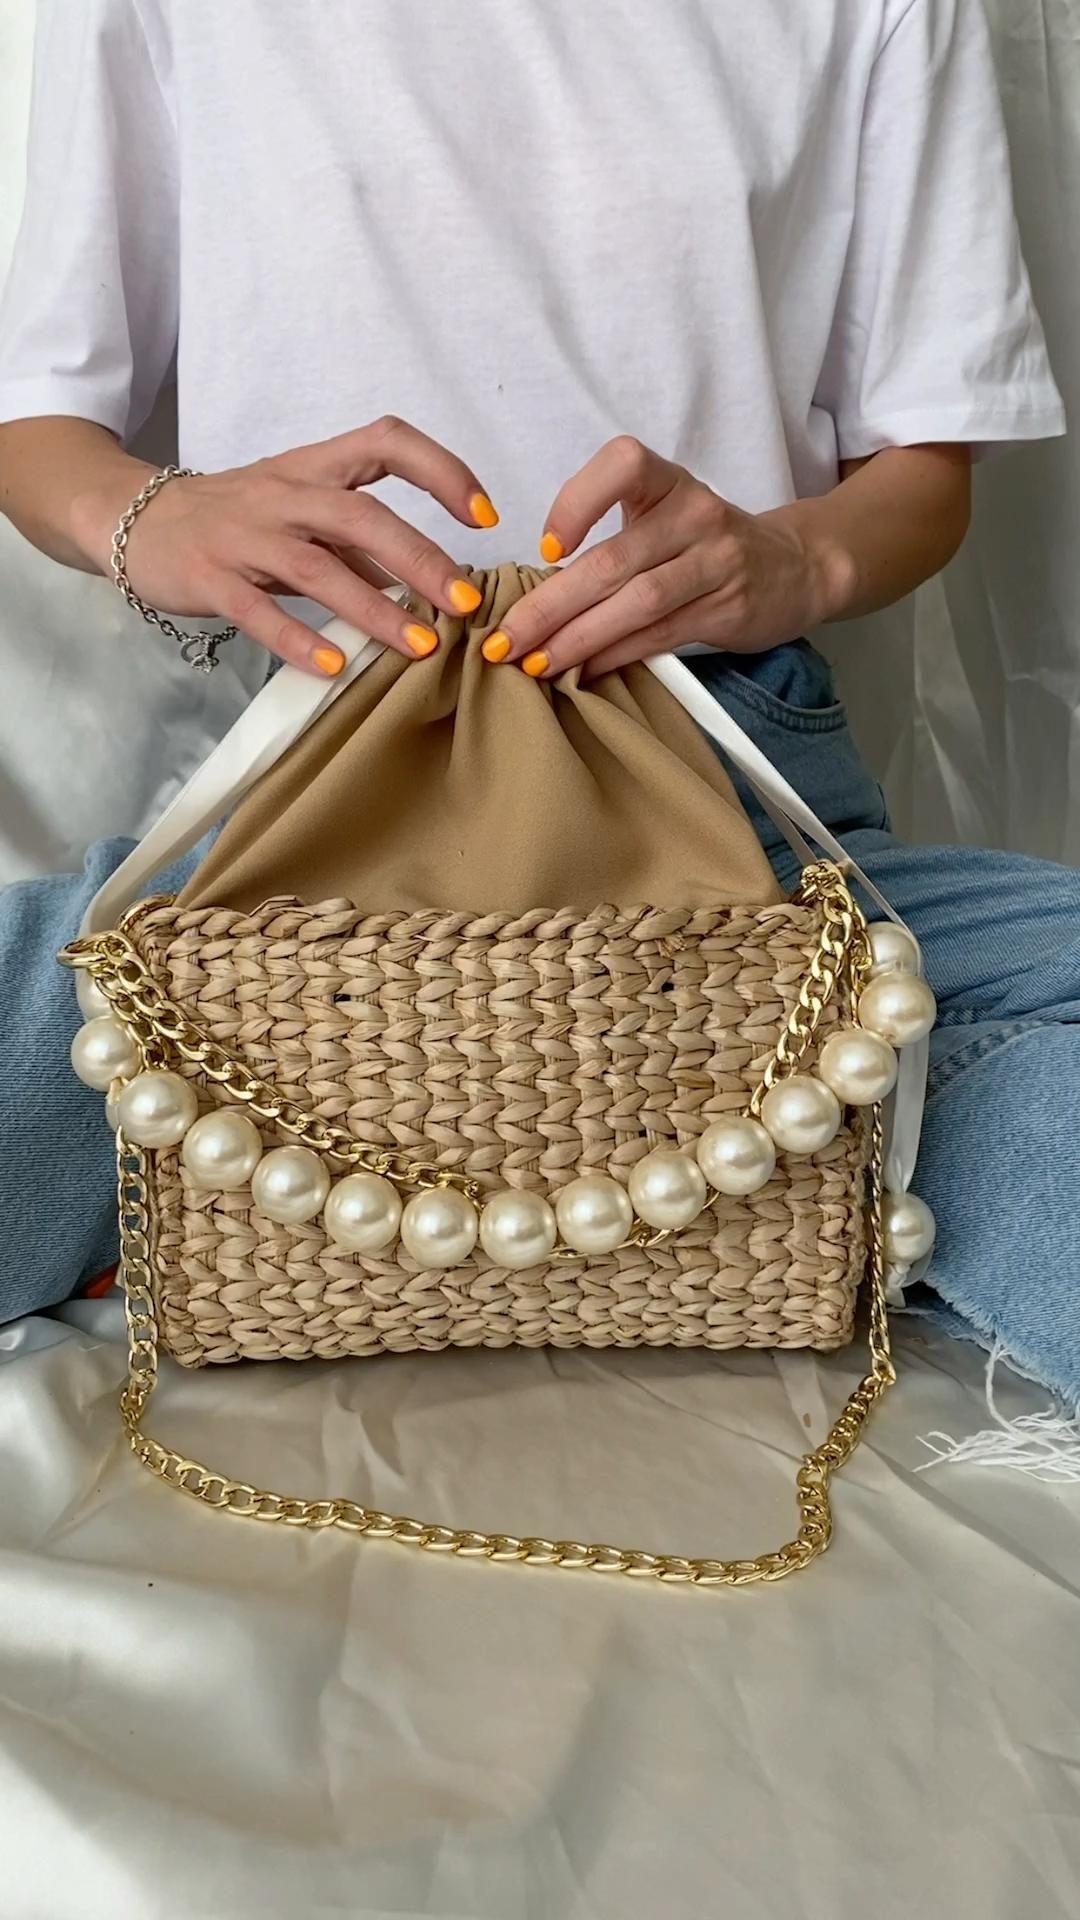 90e Baguette Bag Summer Straw Handbag Pearl Beads Handle Bag | Etsy